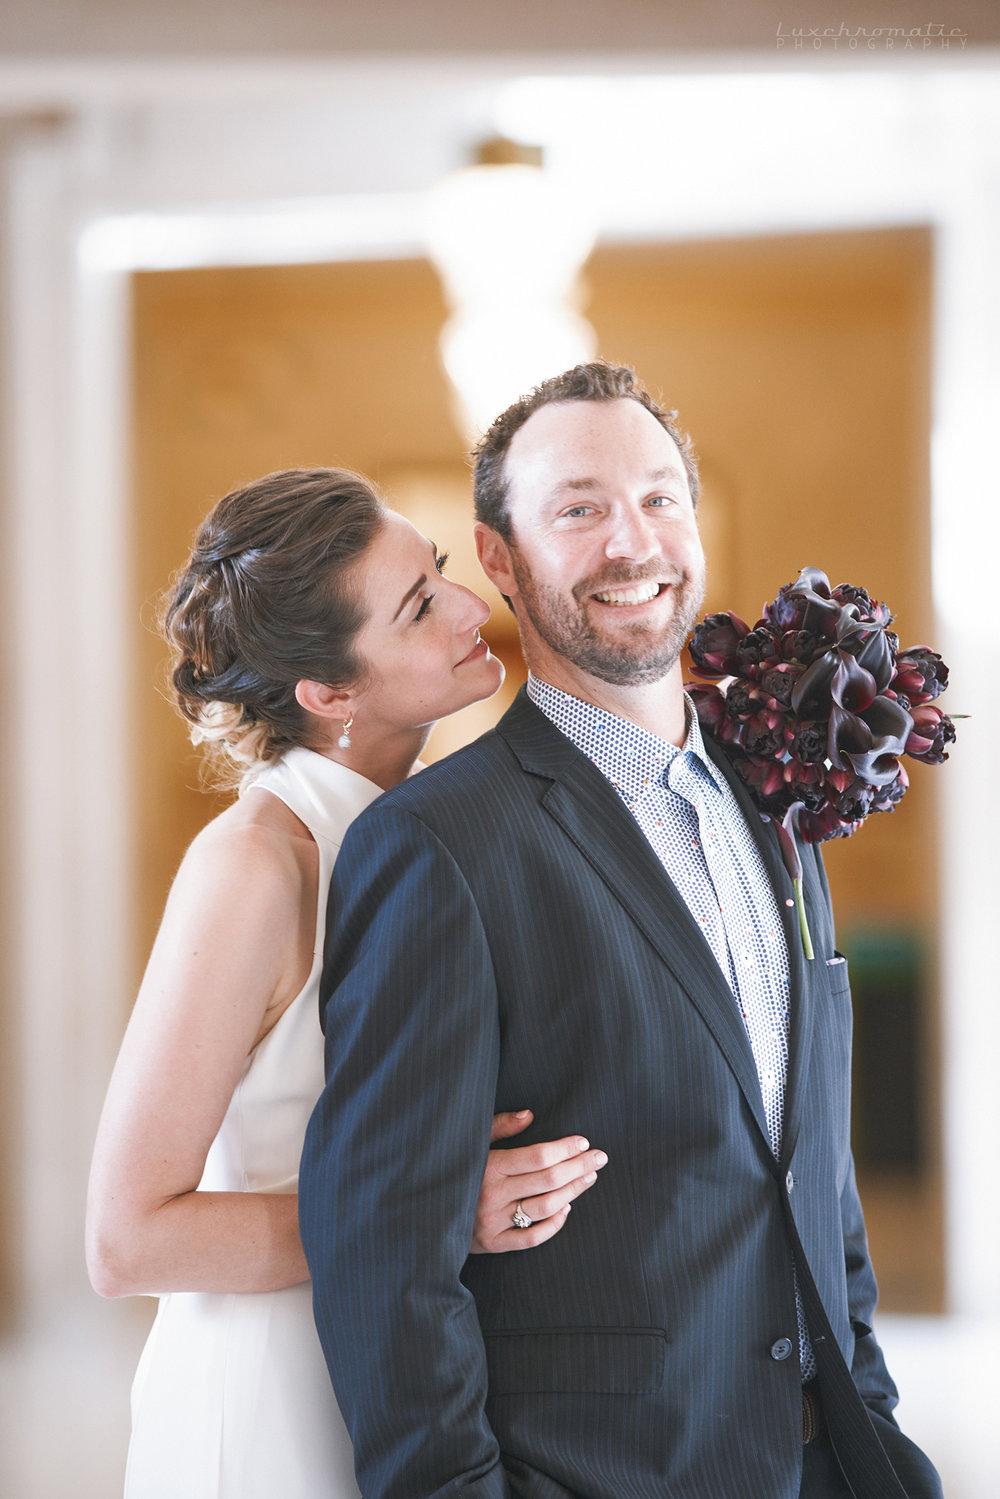 040318_Erin_Brent_0321-weddingdress-bride-weddingphotography-weddingphotographer-bridal-groom-wedding-engagementring-proposal-brides-elopement-sonyalpha-sony-sonya9-sonya7riii-sanfrancisco-sf-bayarea-photographer-profoto-city-hall.jpg